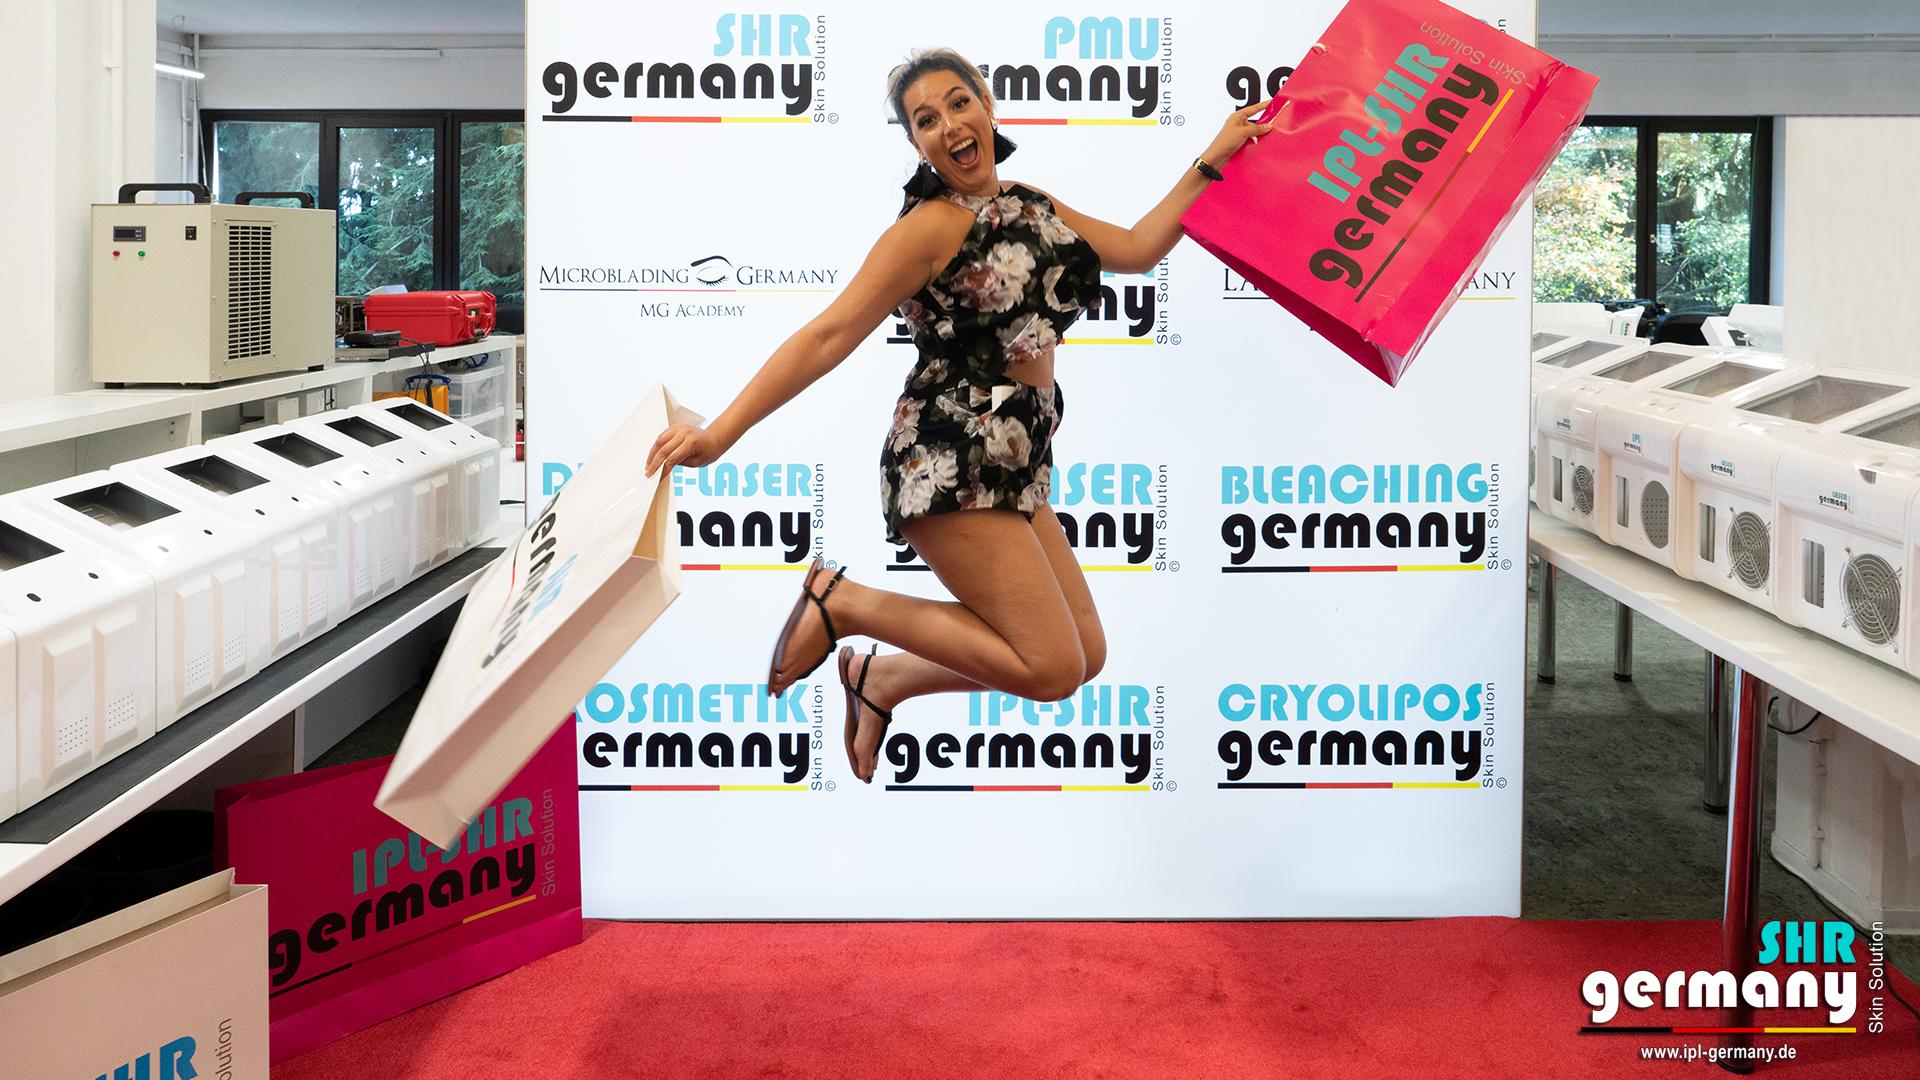 SHR_GERMANY_IPL_2018-08-04_SHR-IPL-HM_32